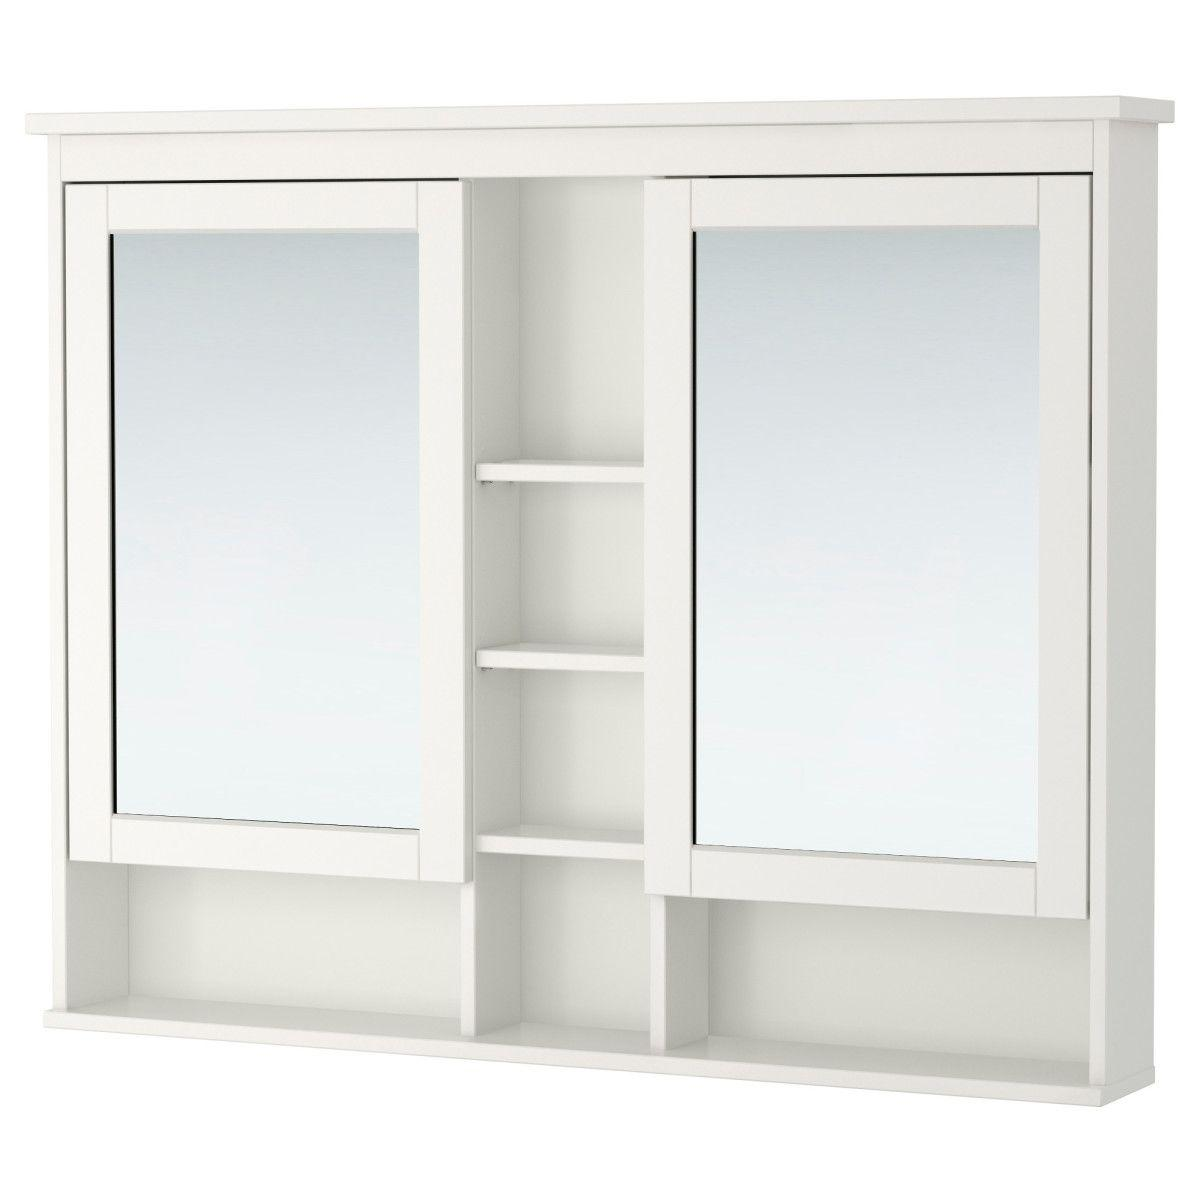 Holz Spiegelschrank Bad Ikea